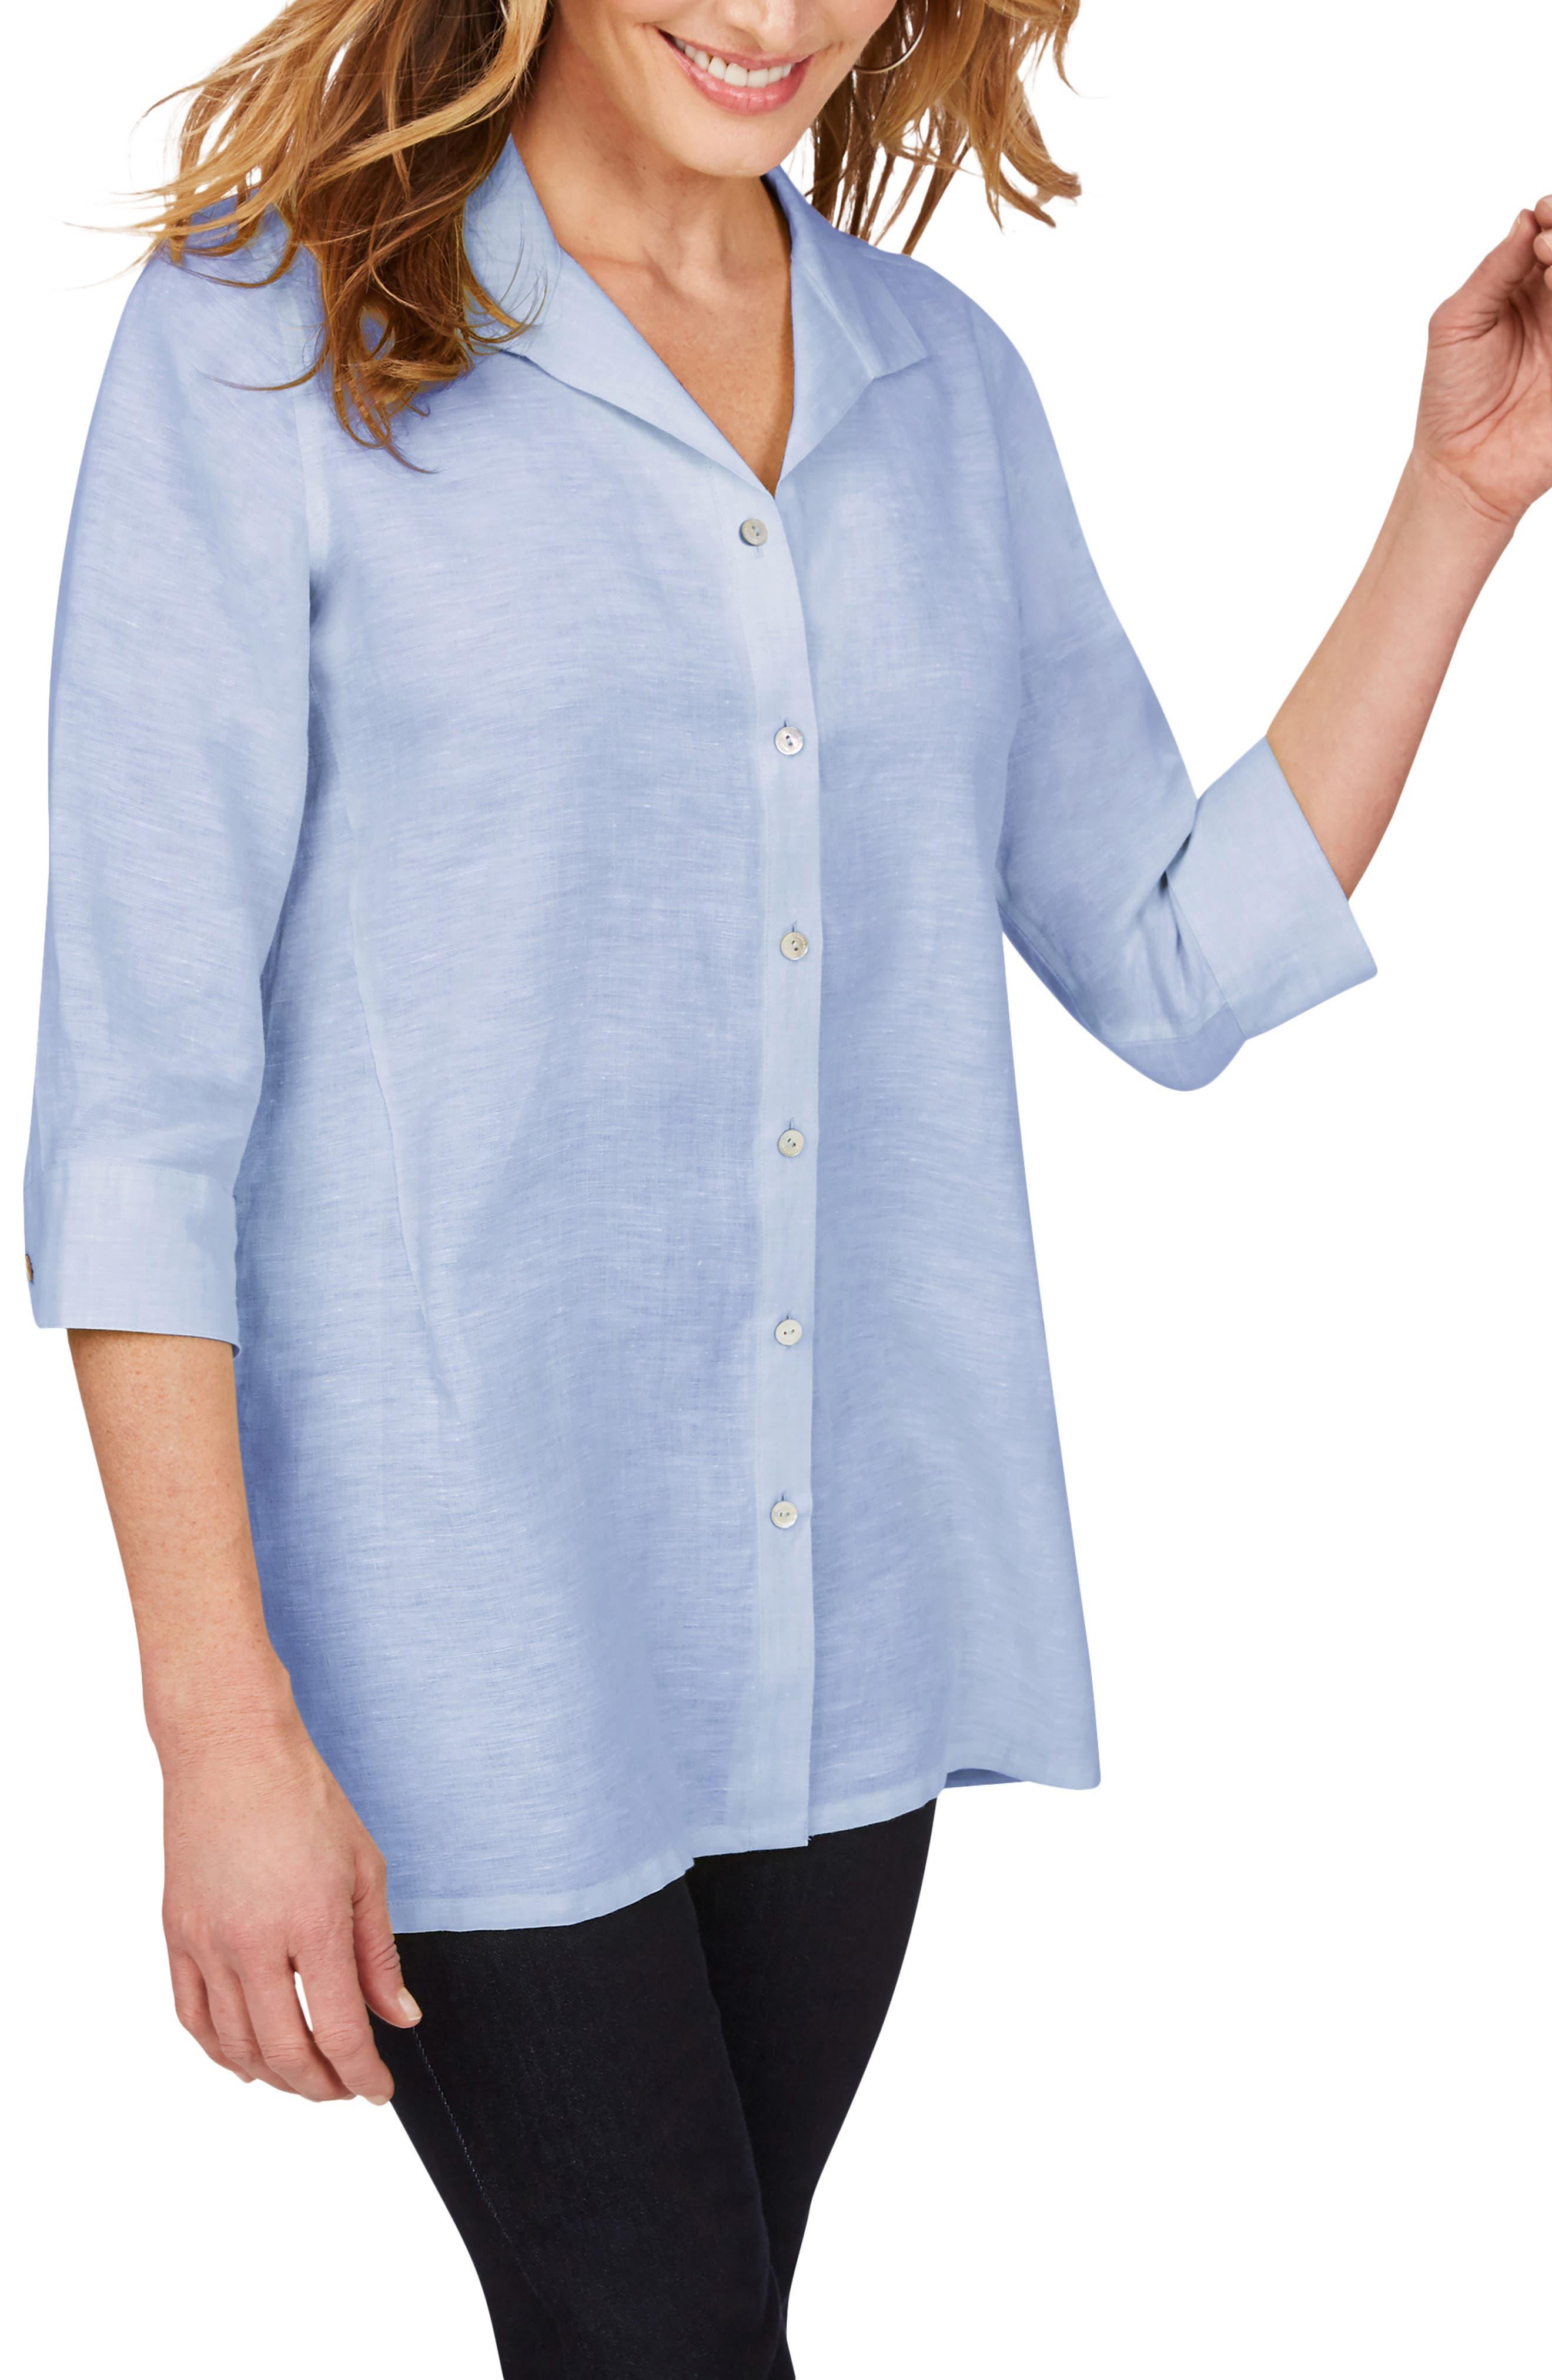 Sterling Button Front Non-Iron Linen Shirt